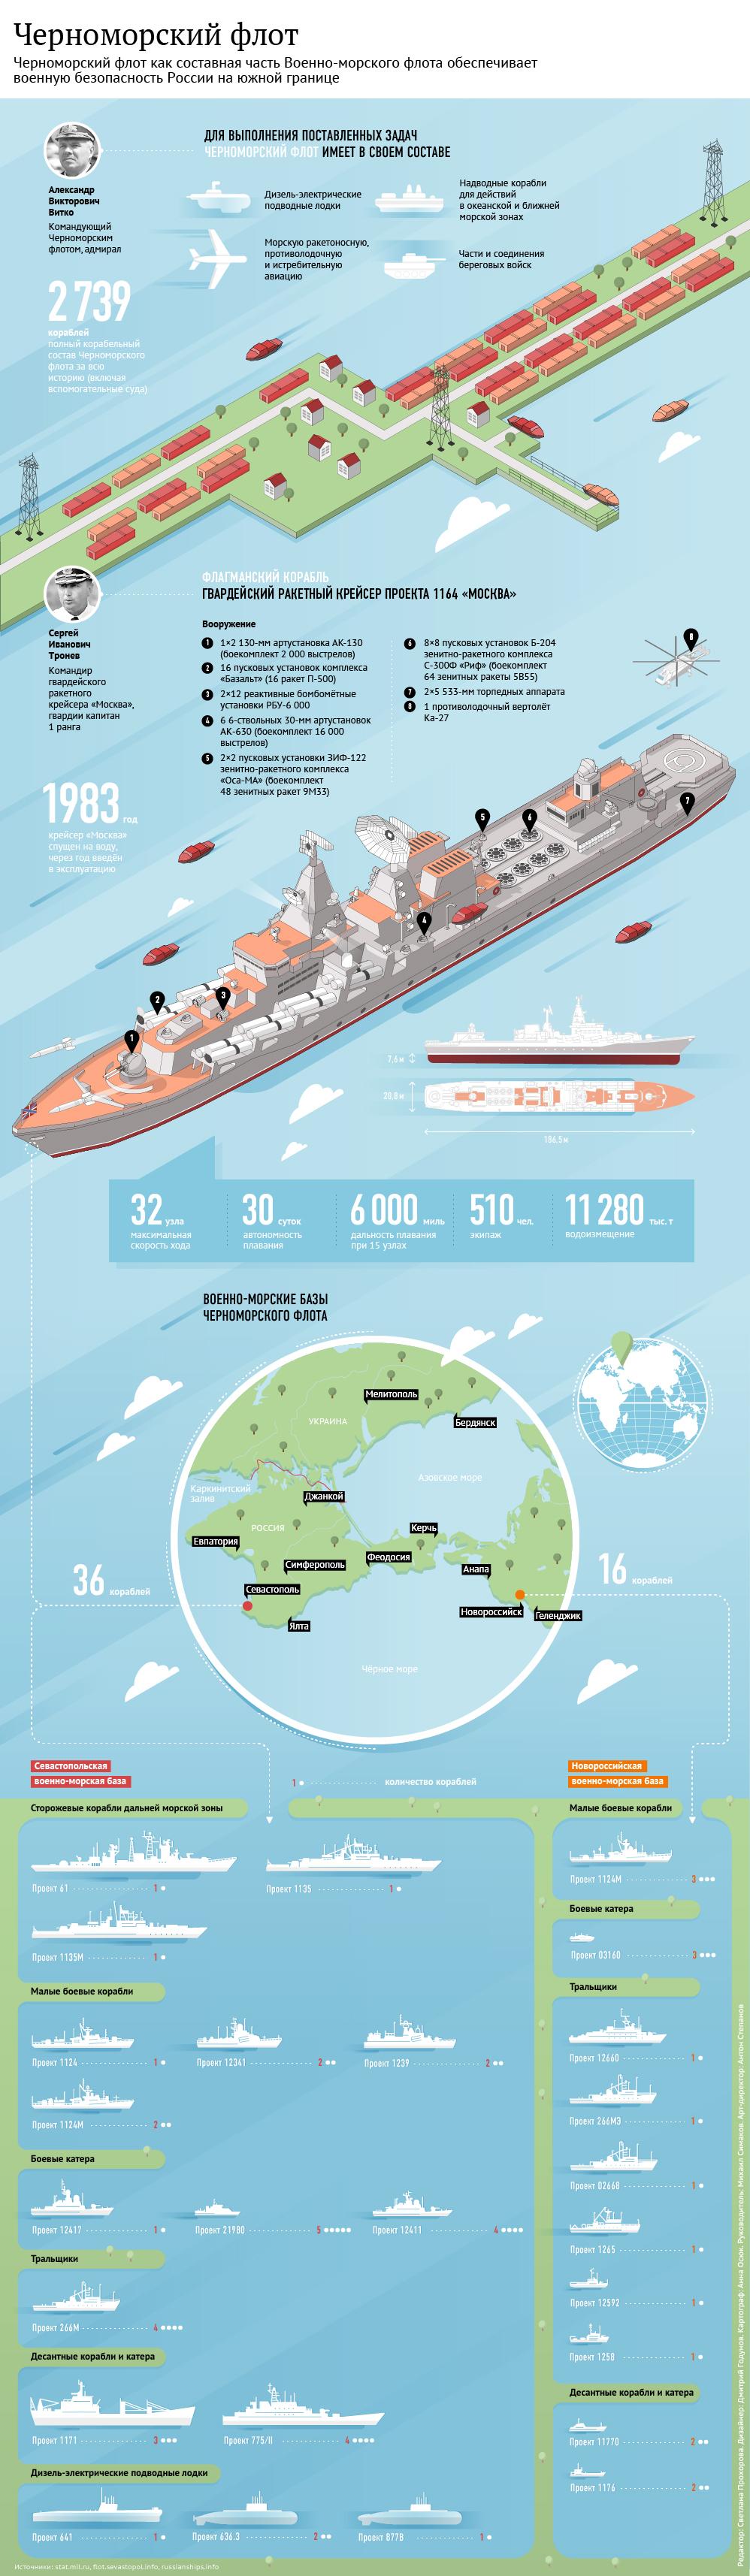 Черноморский флот и его флагман